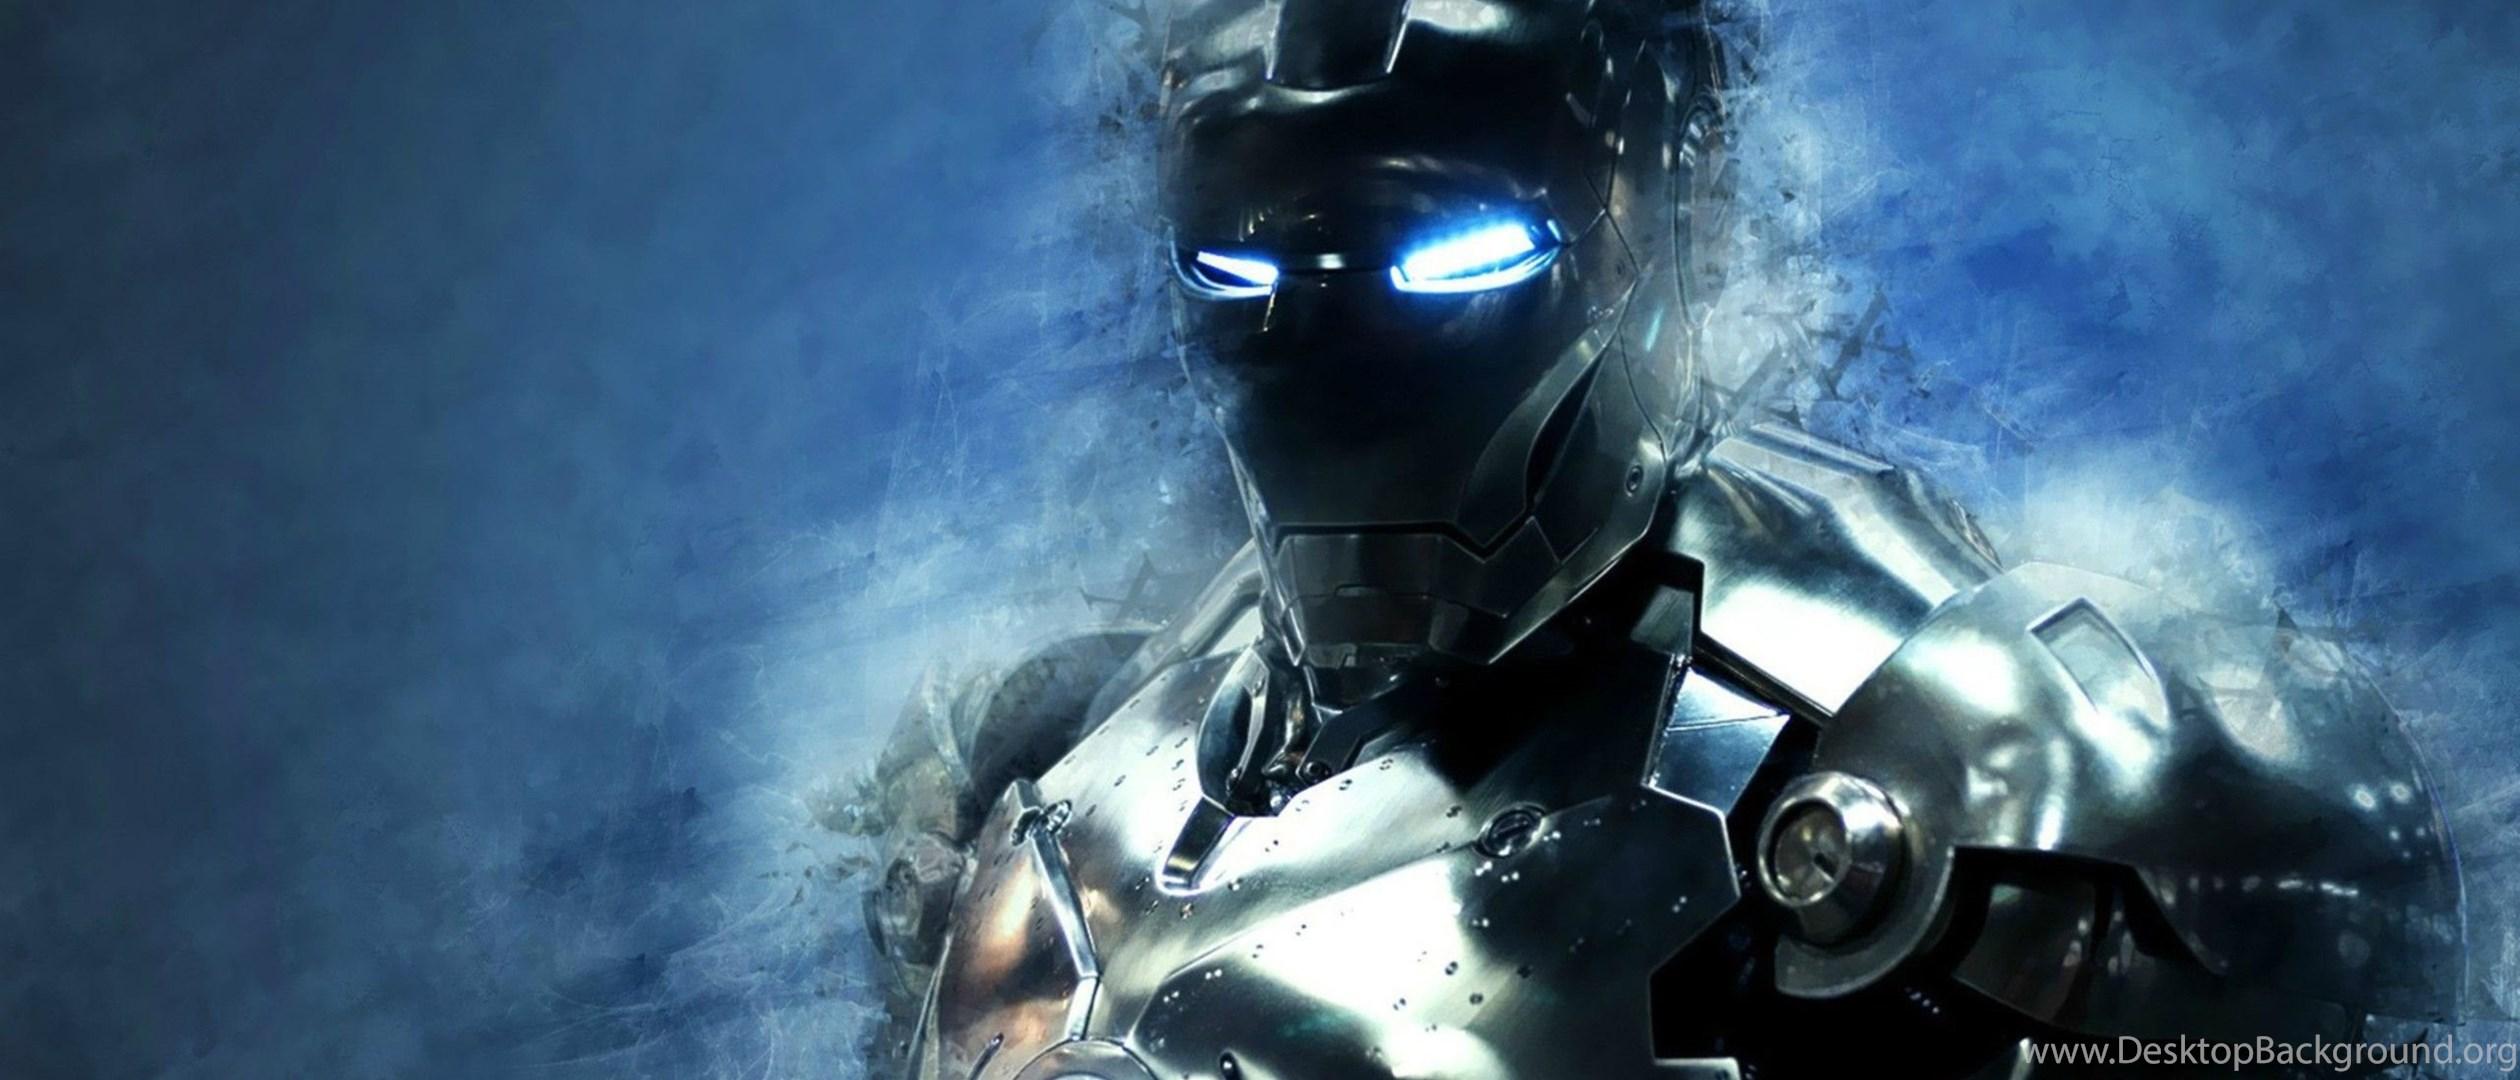 Iron Man 3 Wallpaper Backgrounds Uncalke Com Desktop Background